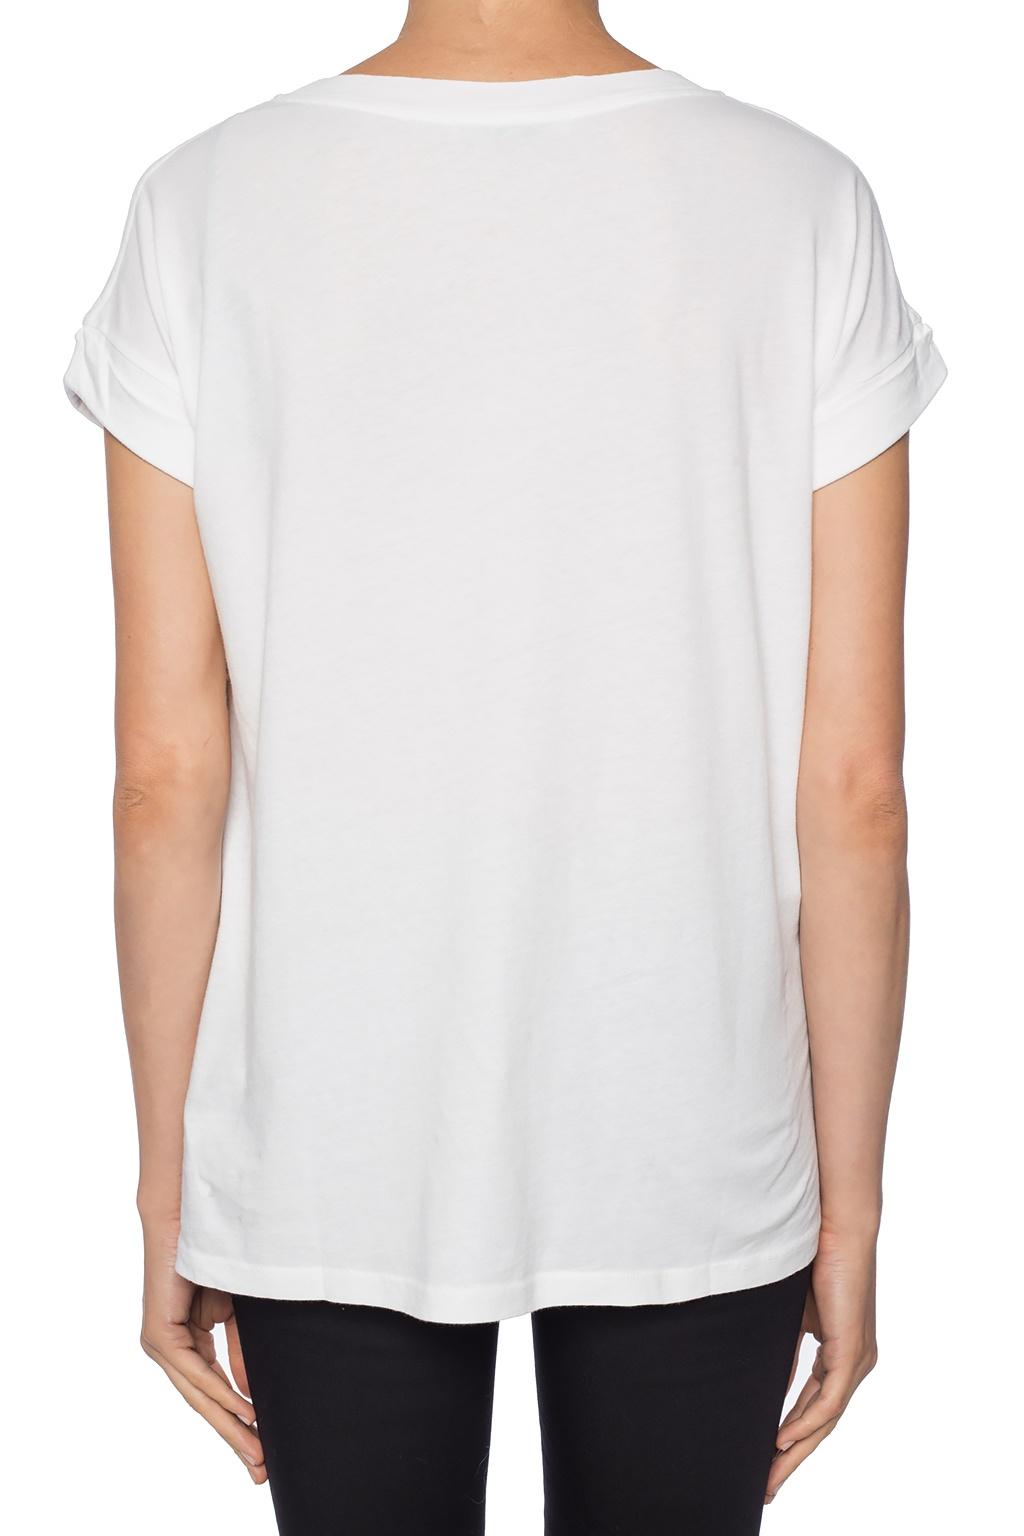 AllSaints 'Imogen' crewneck T-shirt